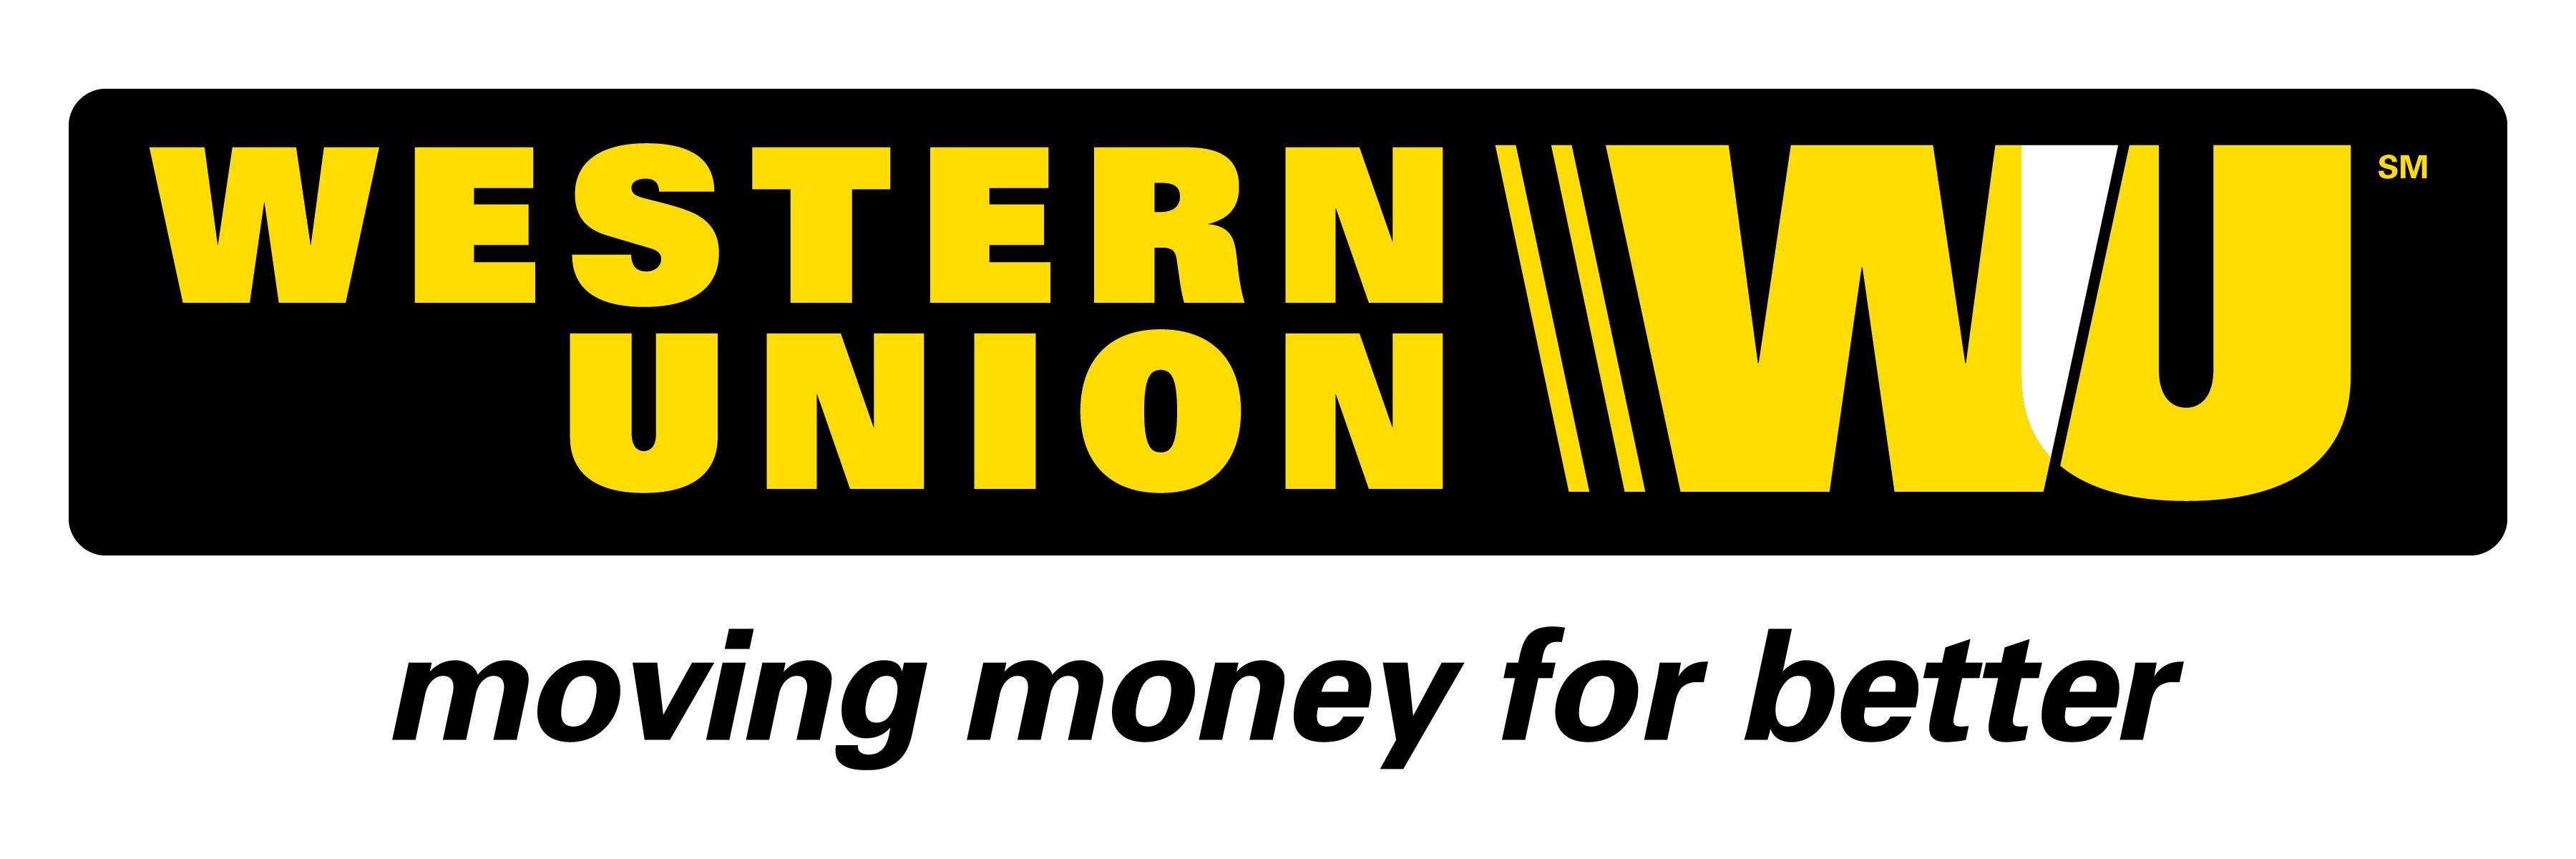 Western Union Receives B2B Innovation of the Year Award for WU® EDGE™ Platform